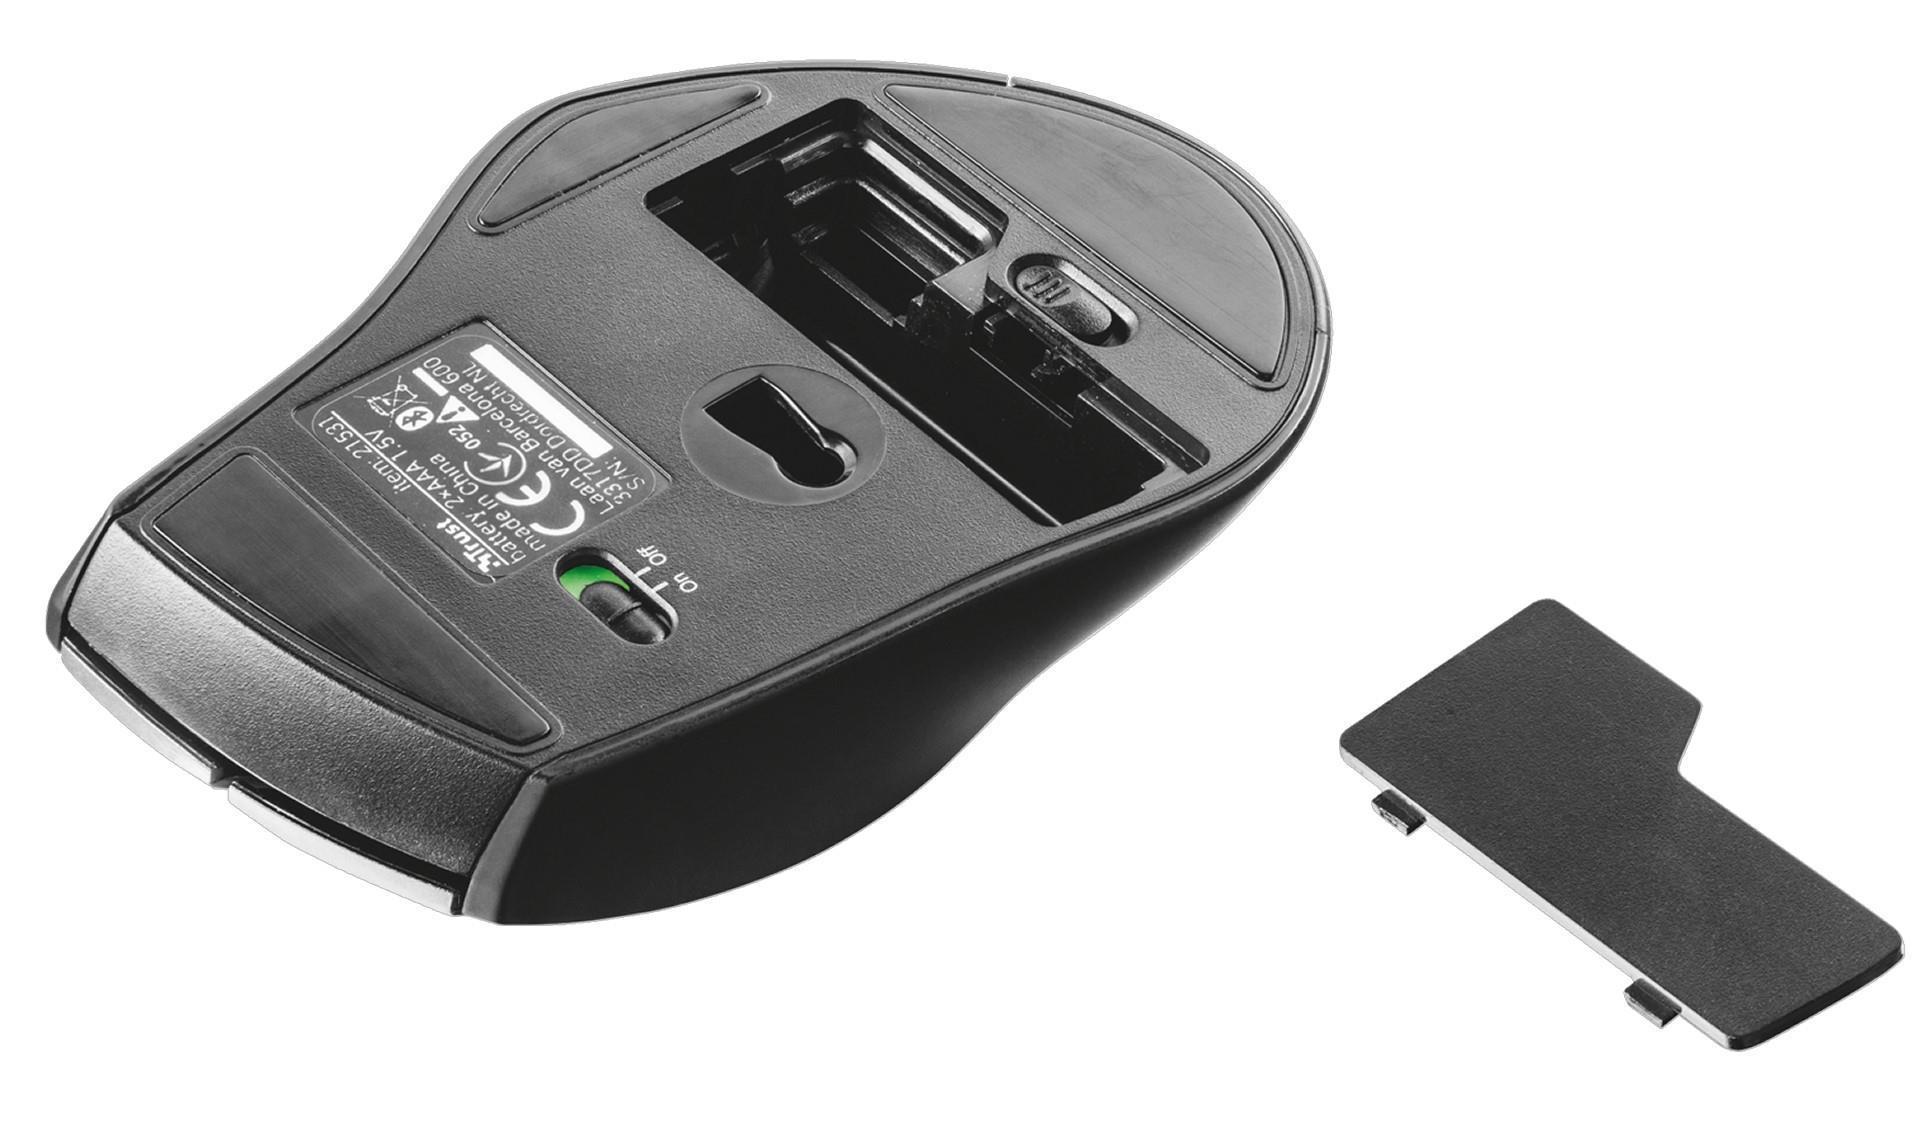 163cbc0e280 Trust MaxTrack Bluetooth Compact Mouse, 21531 | Box.co.uk